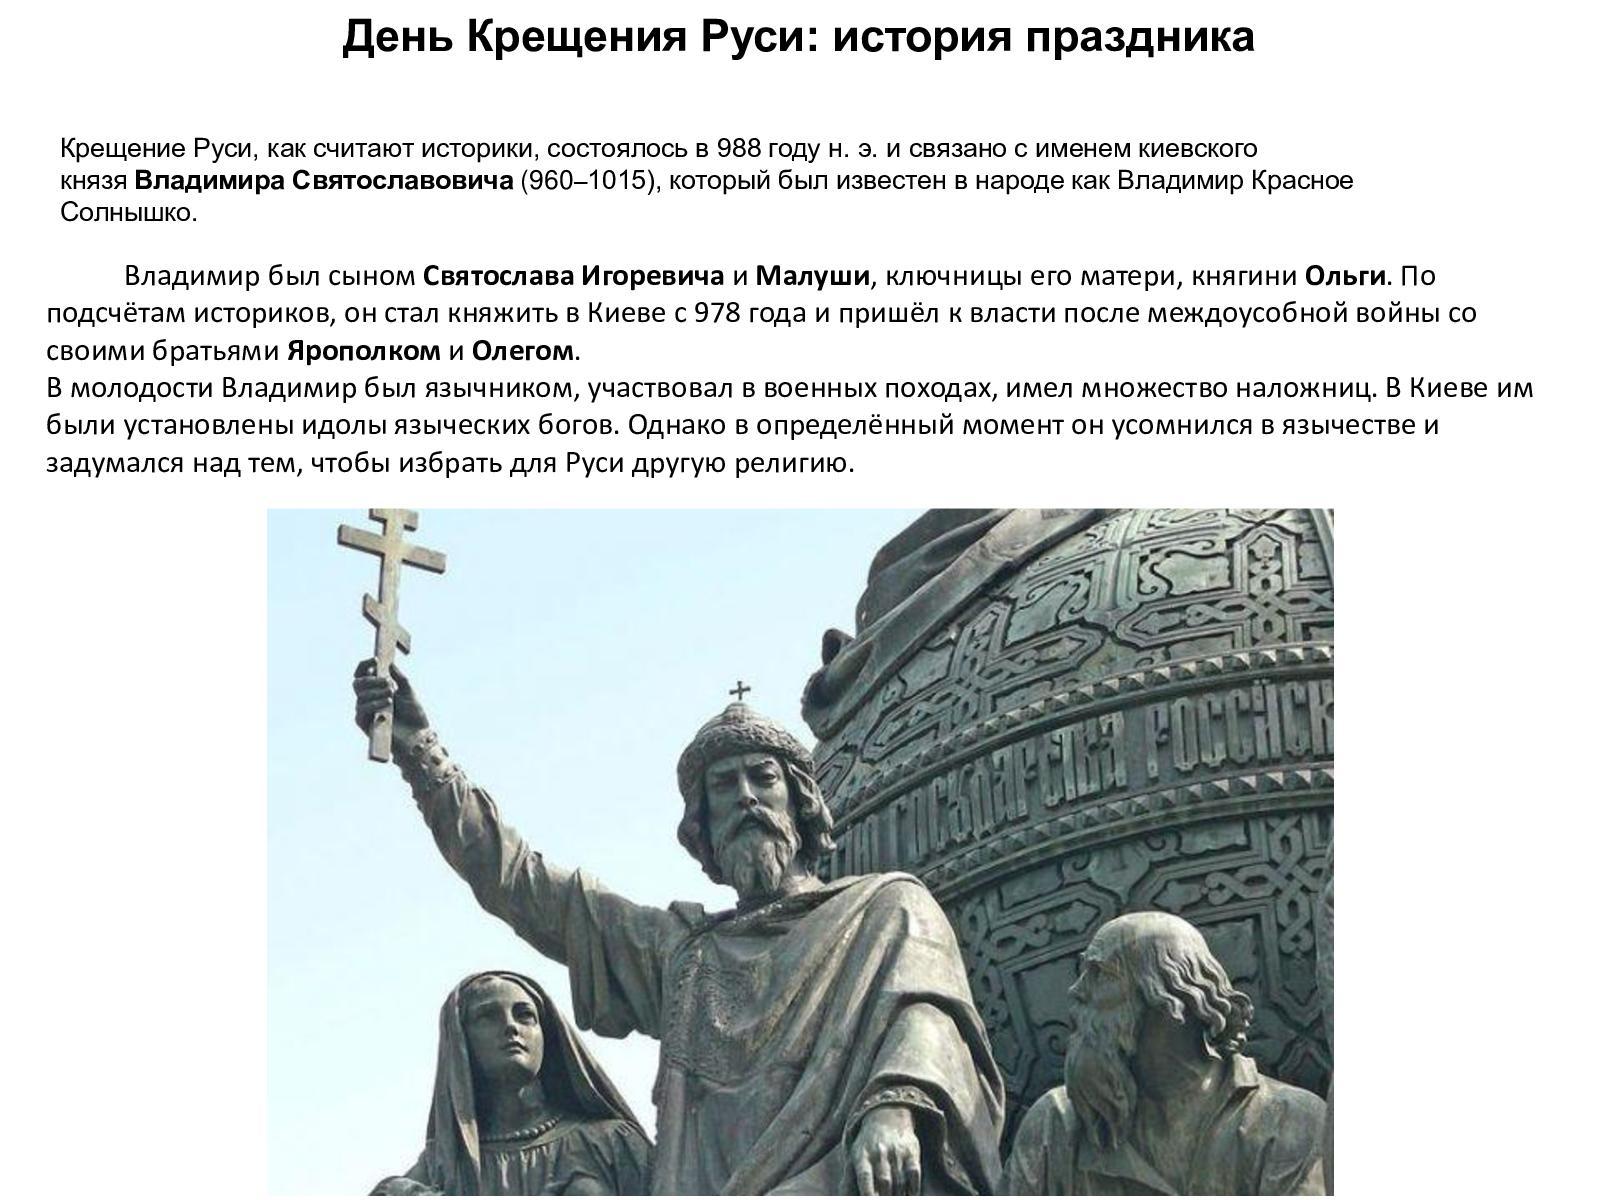 где принял христианство князь владимир